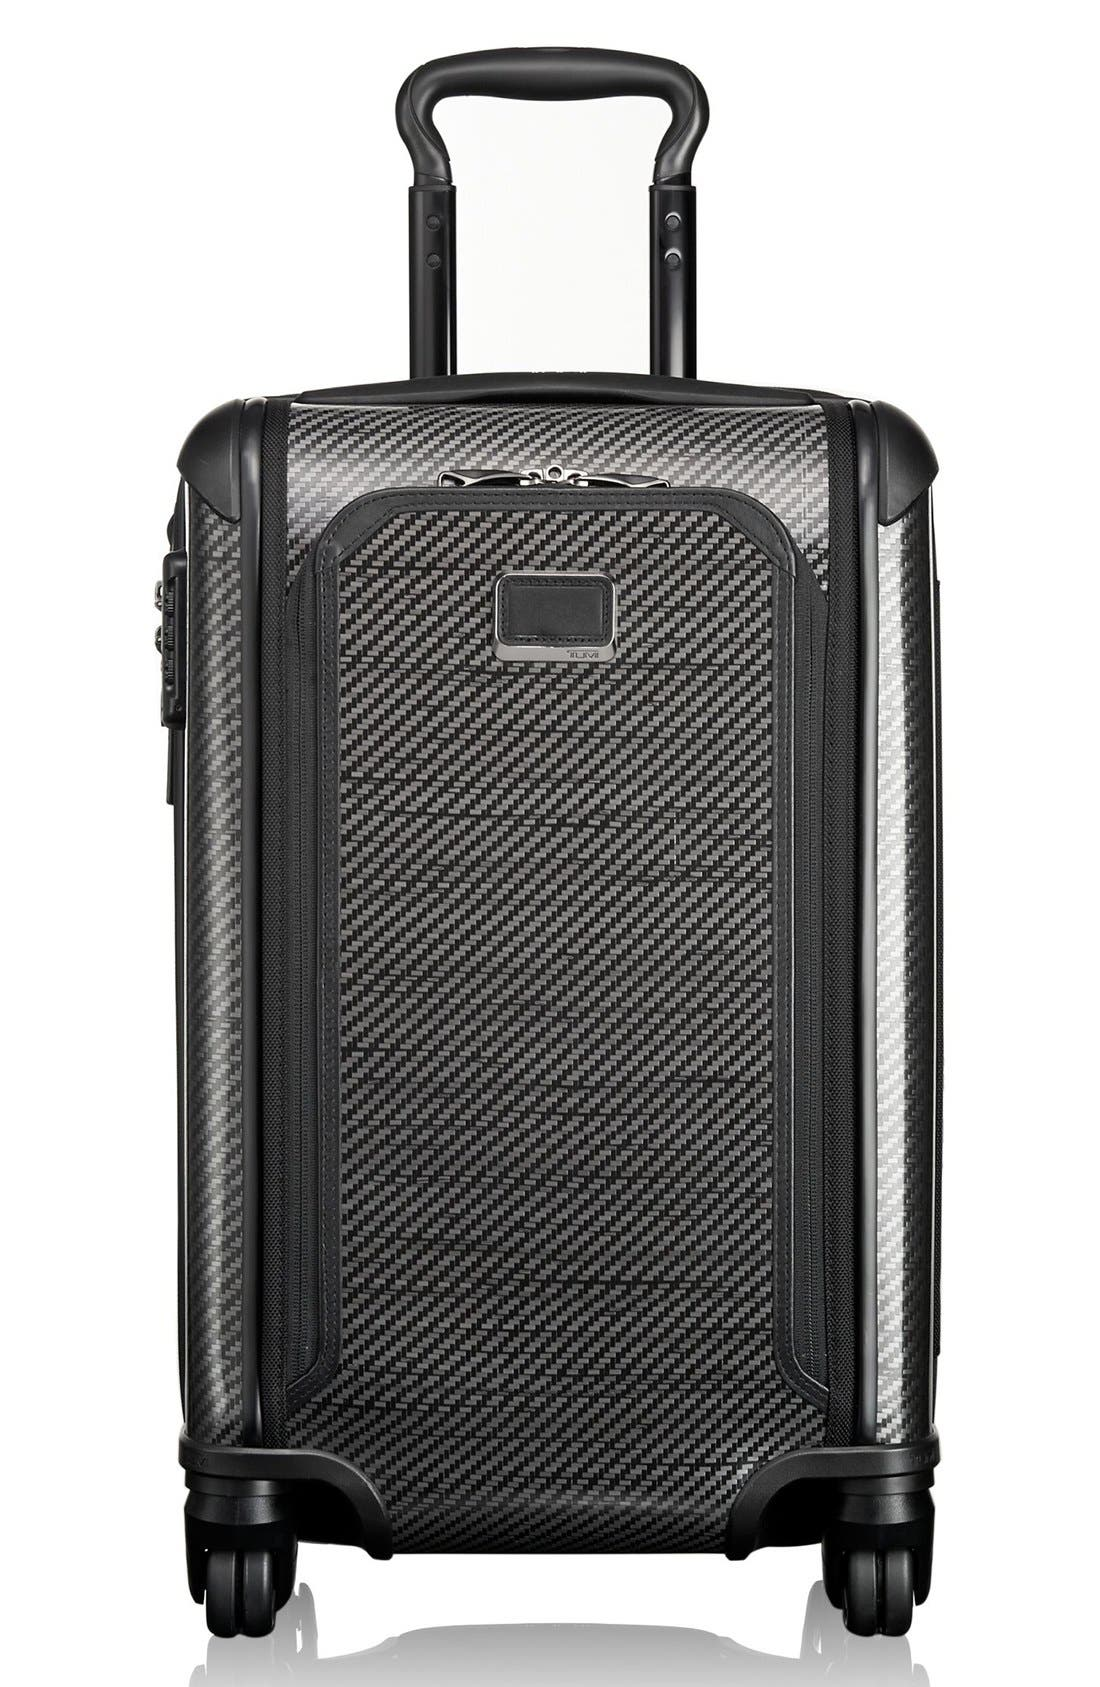 Tumi Tegra-Lite® Max 22 Inch Carry-On